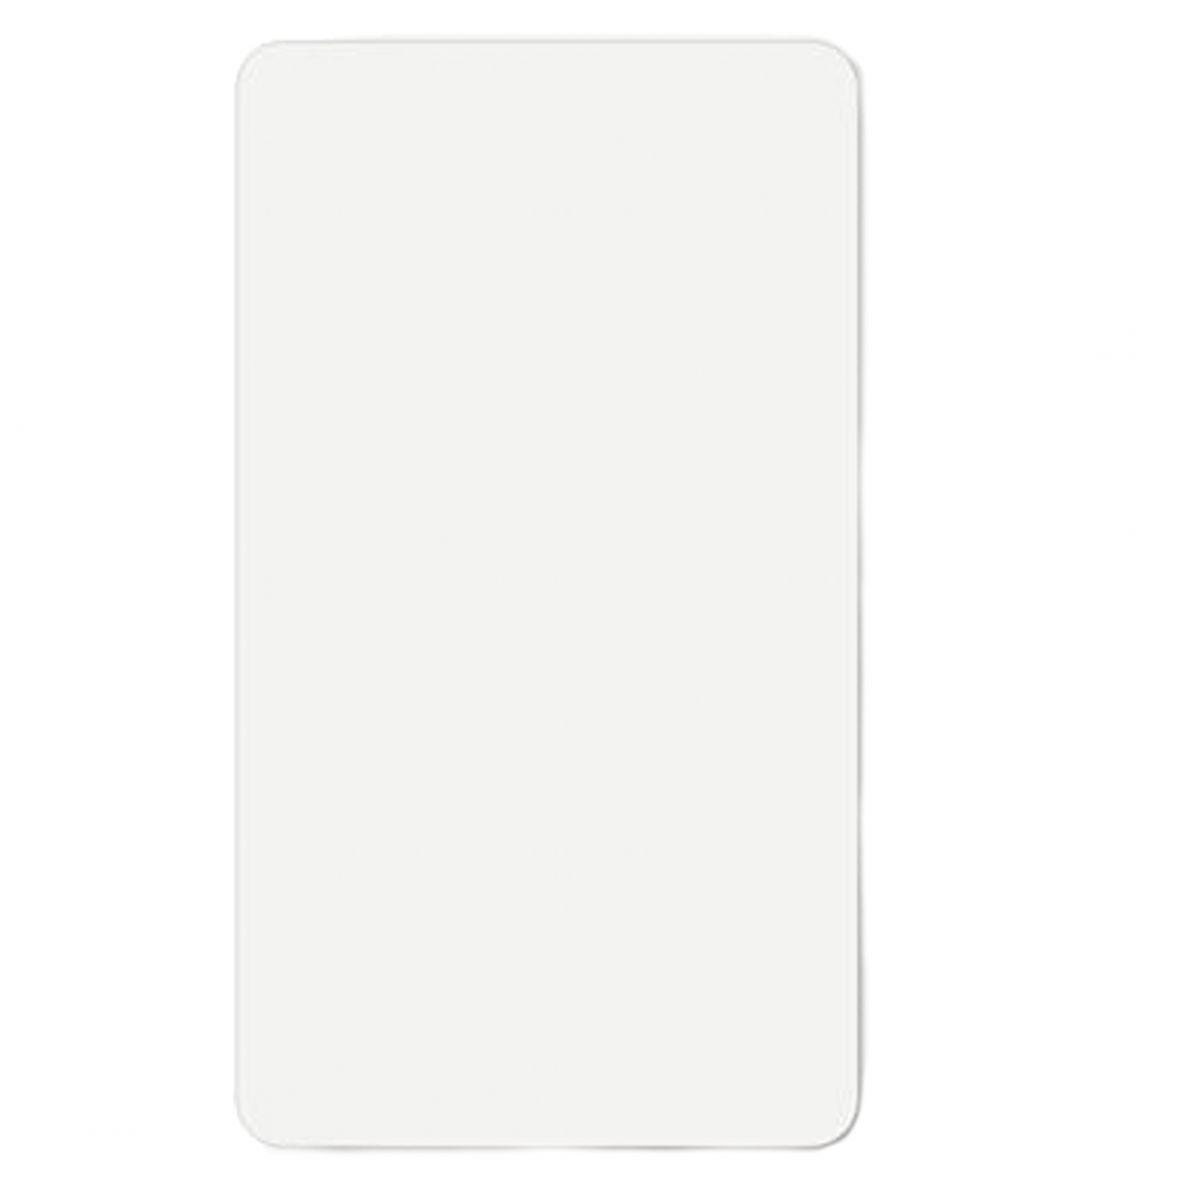 100 Cartões PVC Branco 0,76 mm